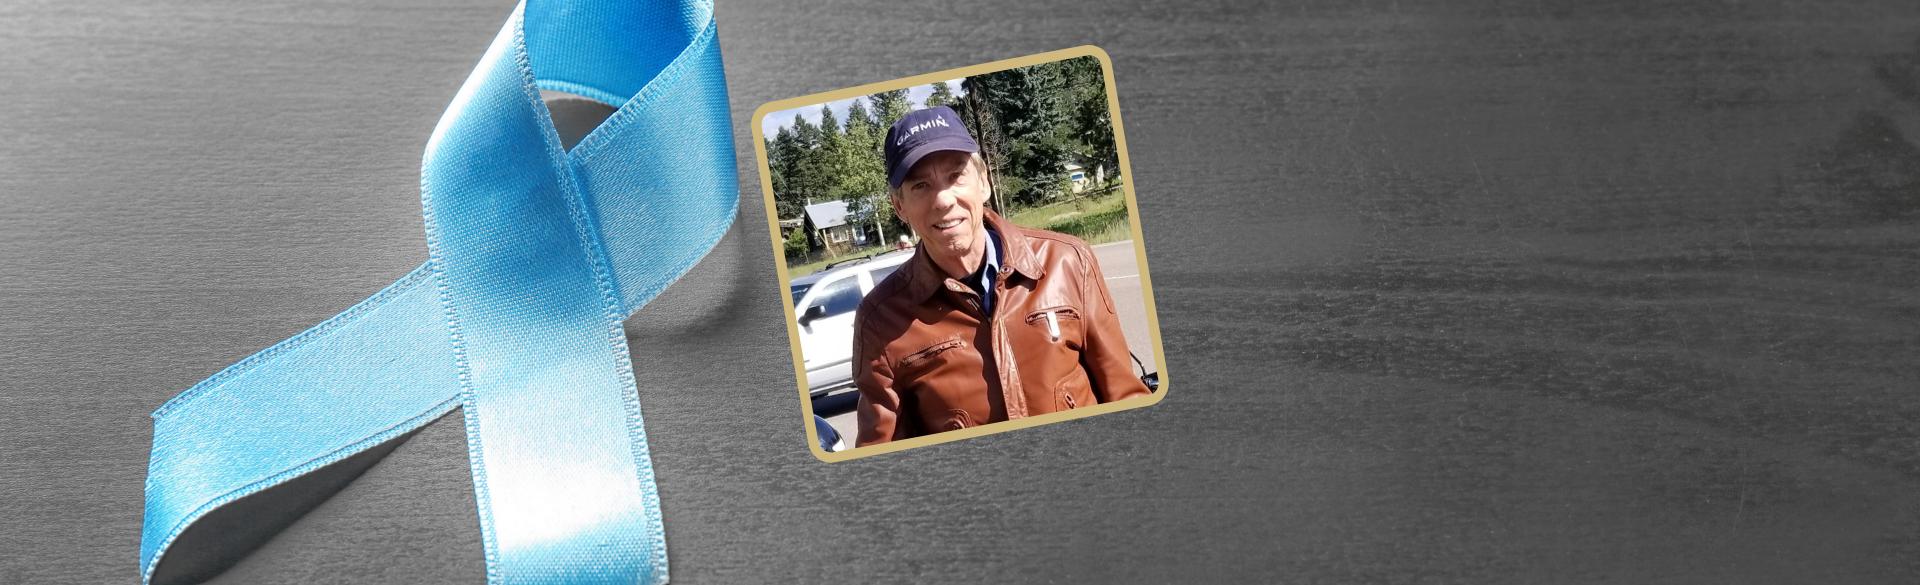 Ashton Villars Prostate Cancer Patient and Donor | CU Cancer Center | Aurora, Colorado